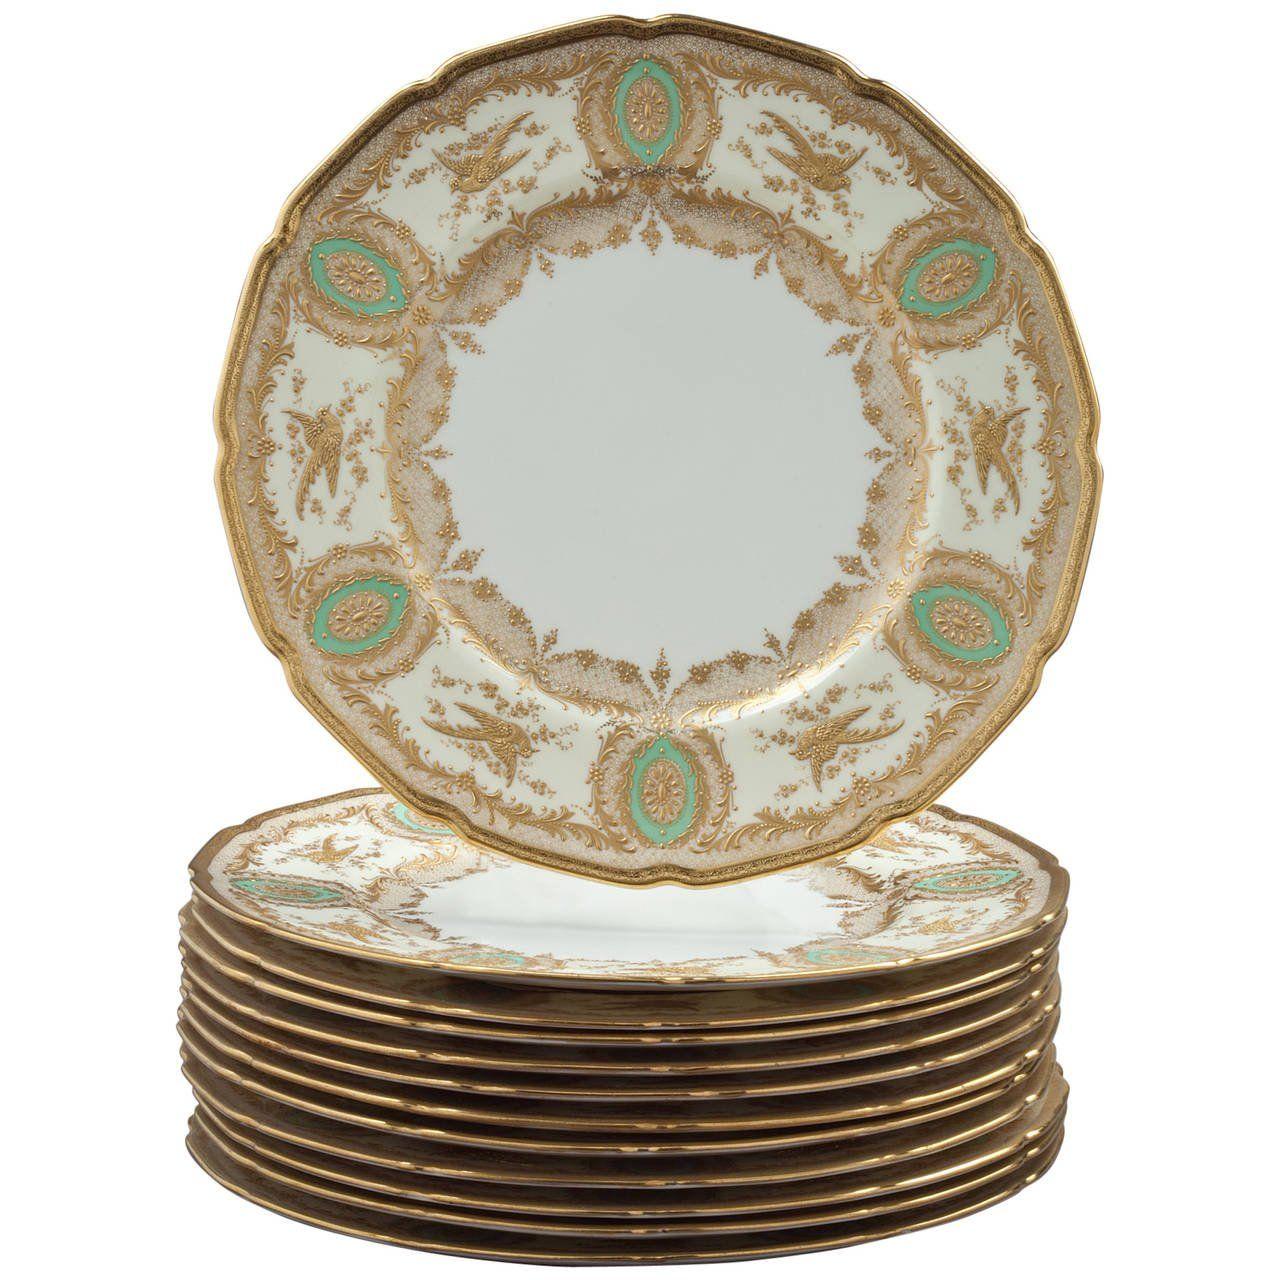 Set of 12 English Porcelain Dinner Plates, Royal Doulton ...